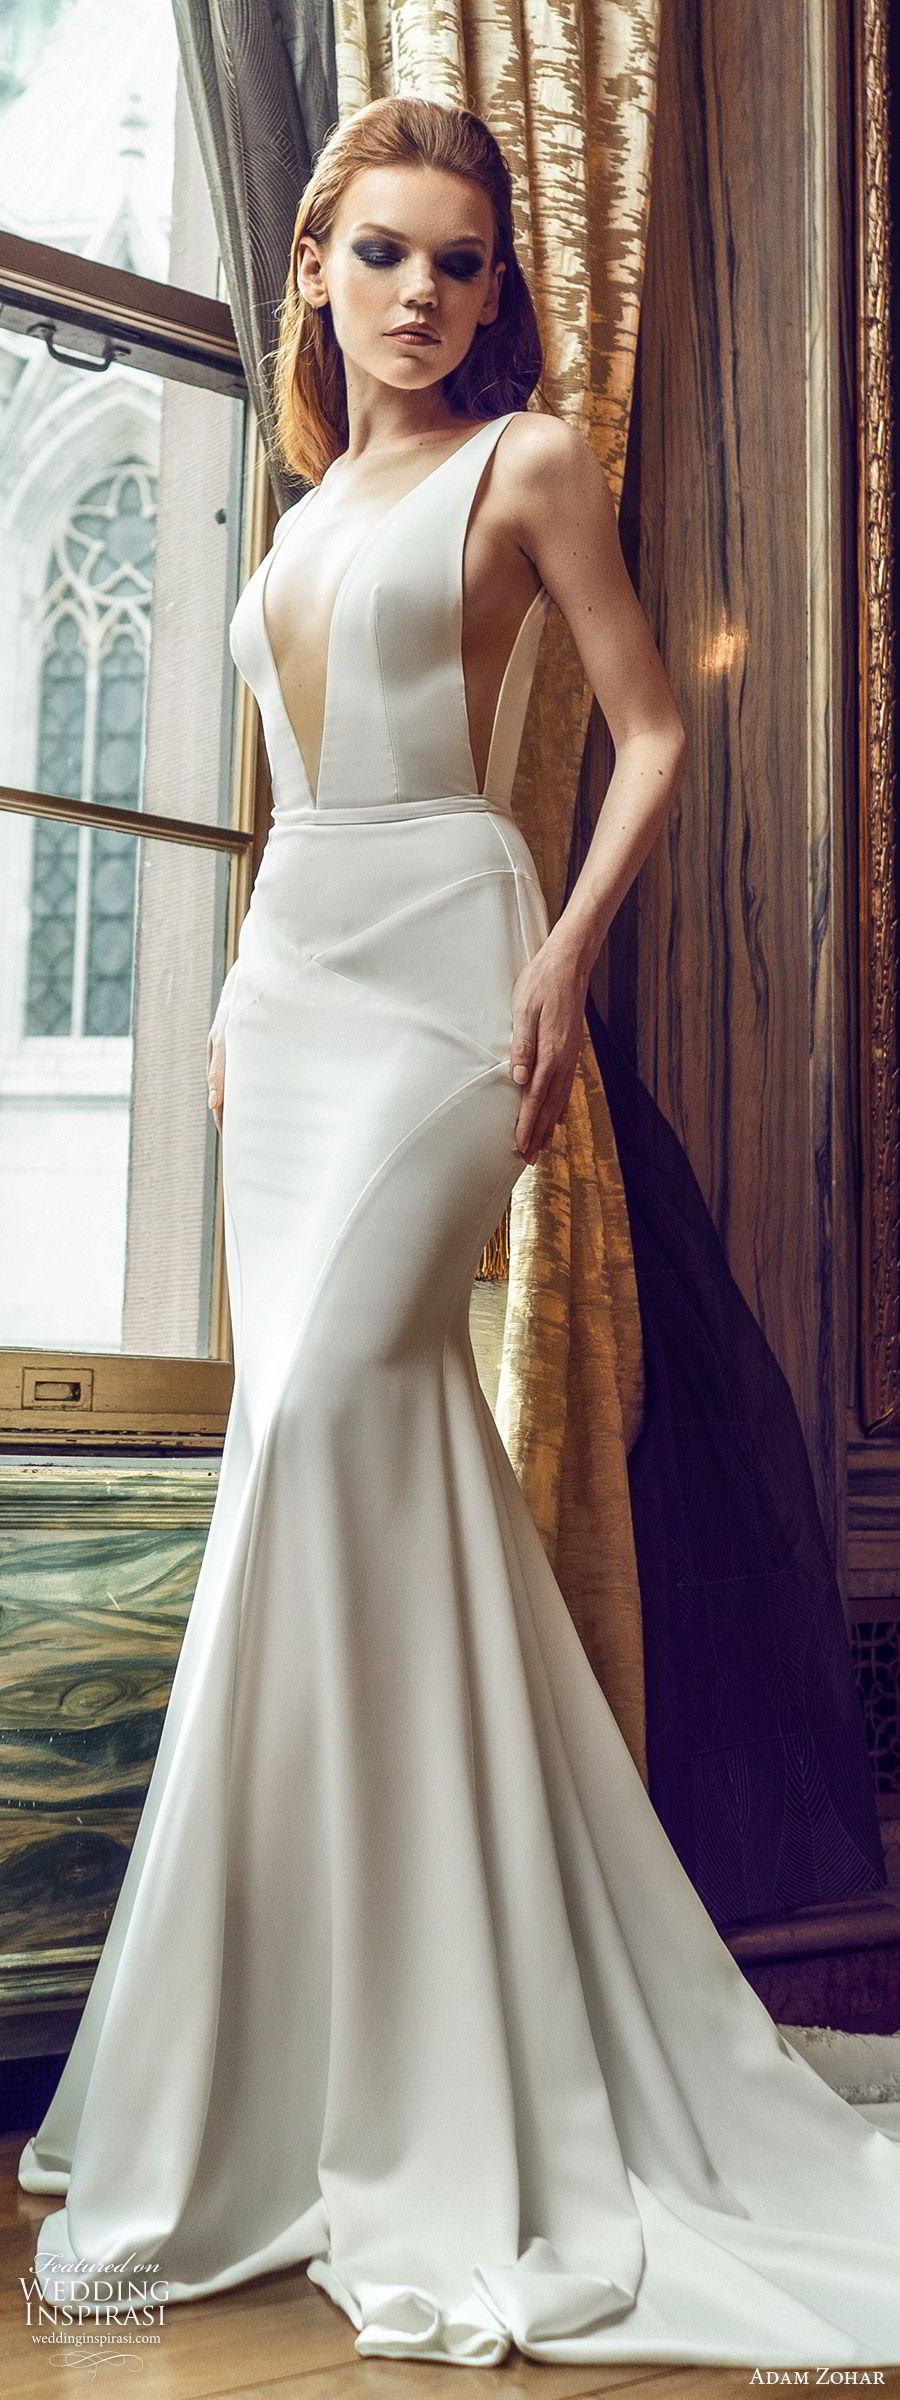 adam zohar 2020 bridal sleeveless straps deep v neckline minimal sheath wedding dress (4) clean modern chic lace chapel train lv